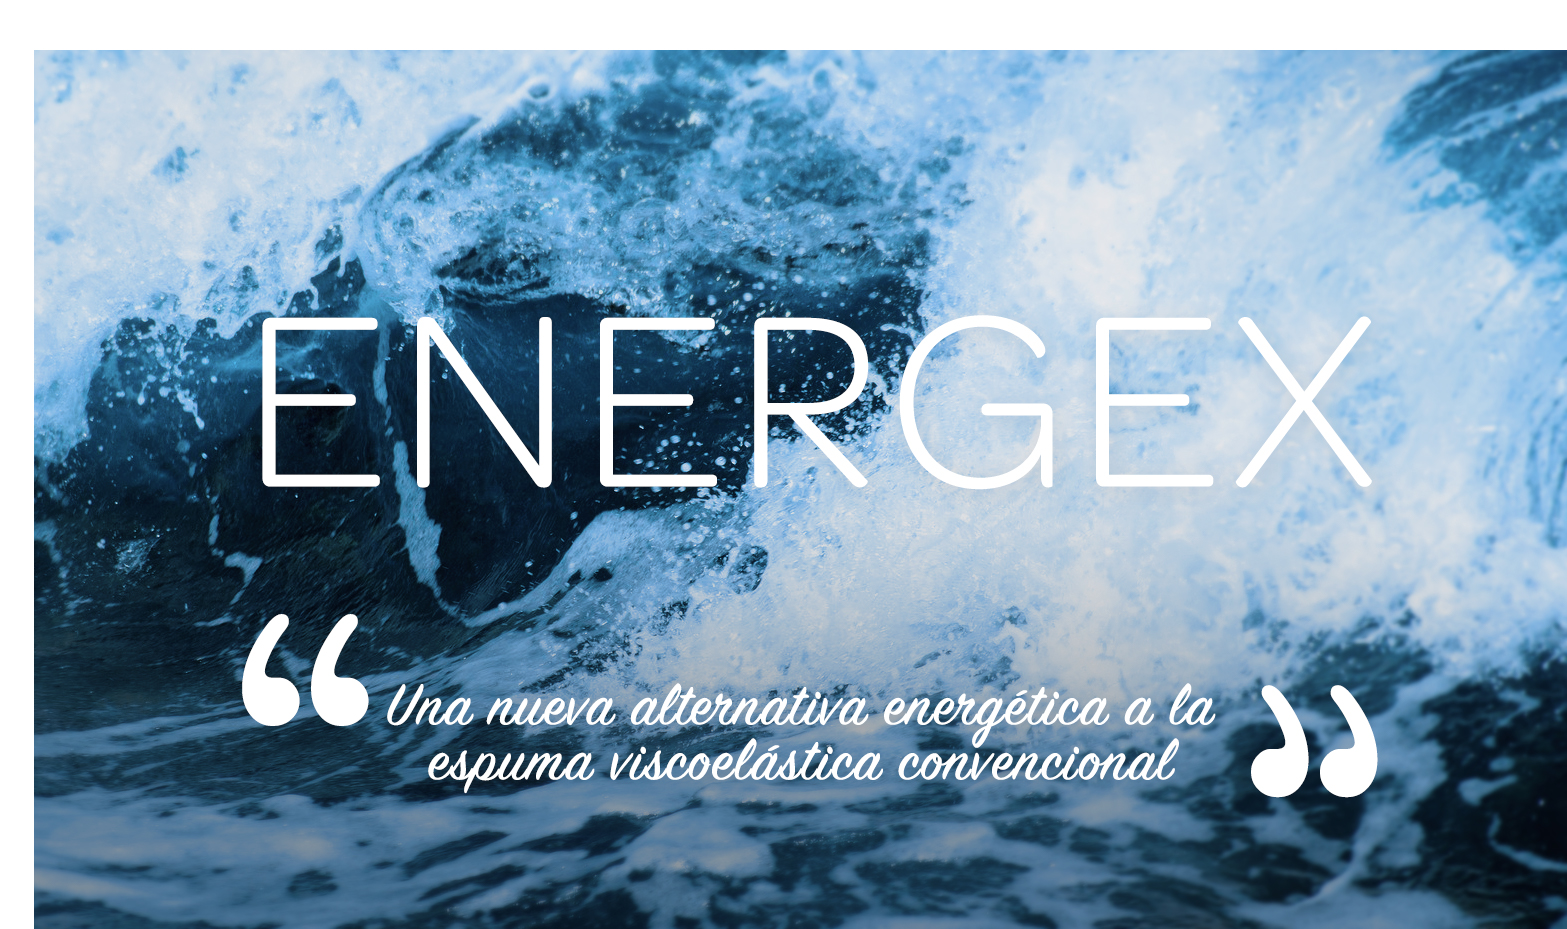 energex.jpg